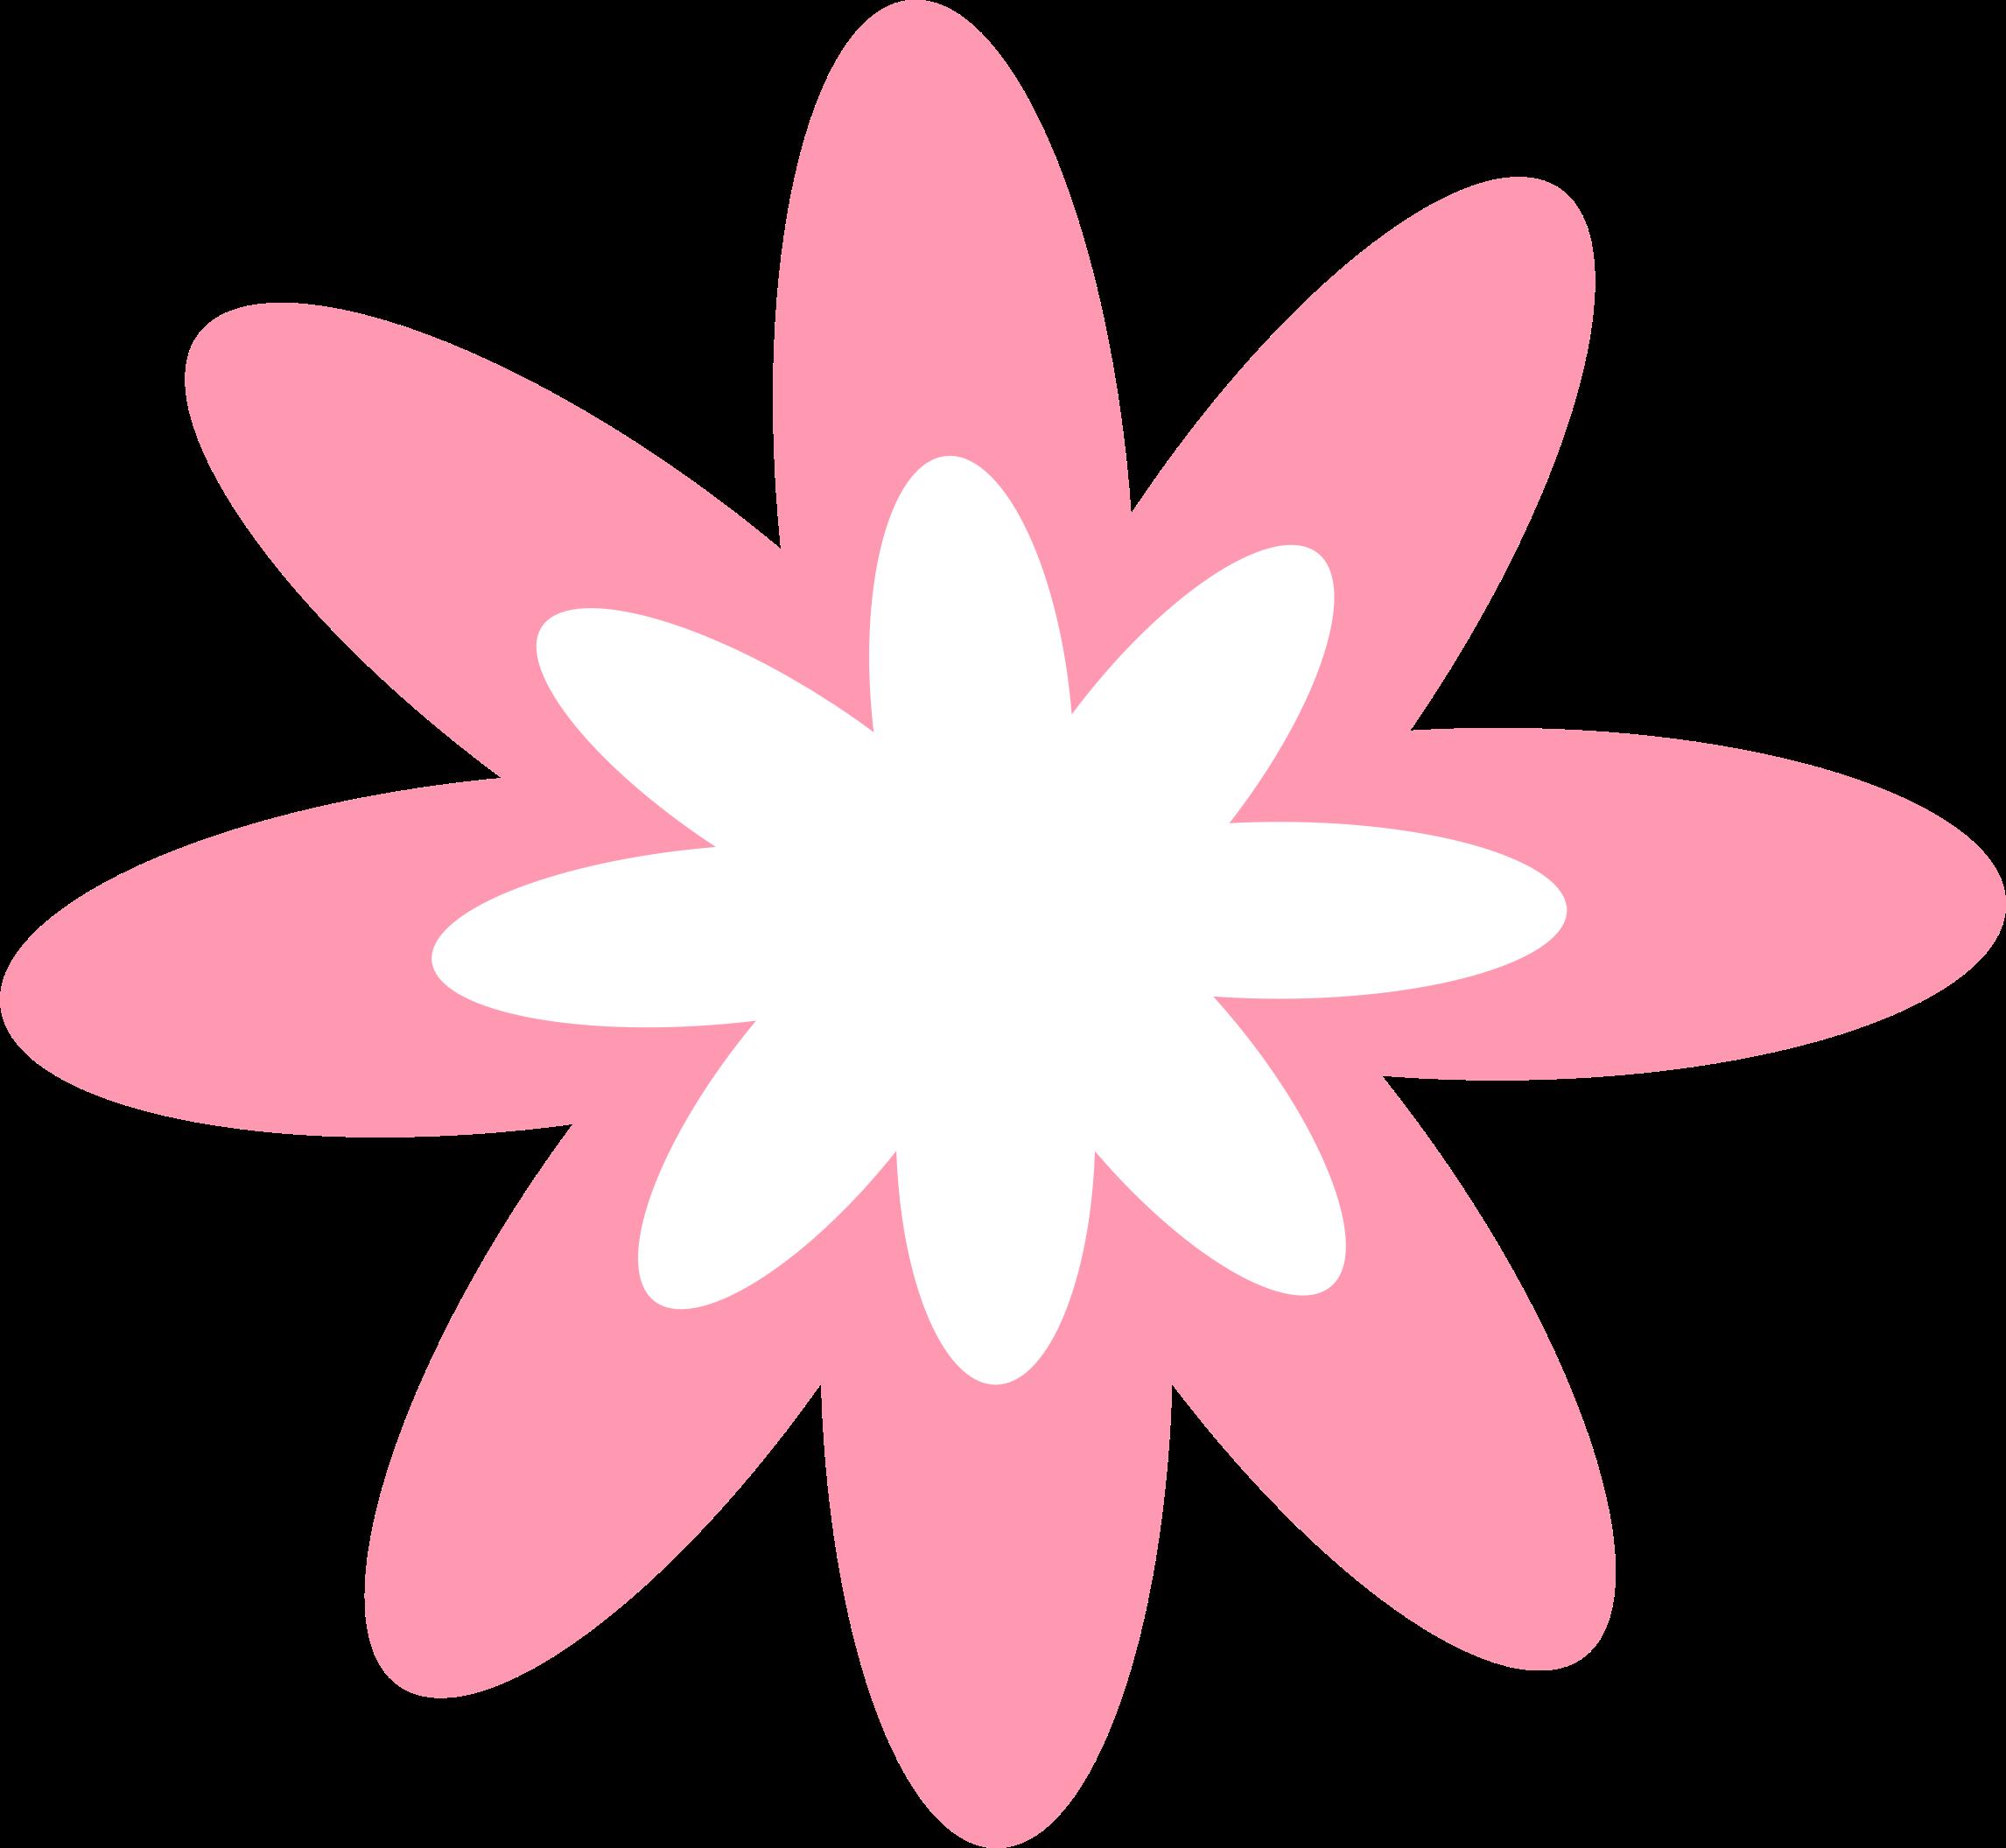 Flower burst clipart image royalty free download Clipart - Pink Burst Flower image royalty free download